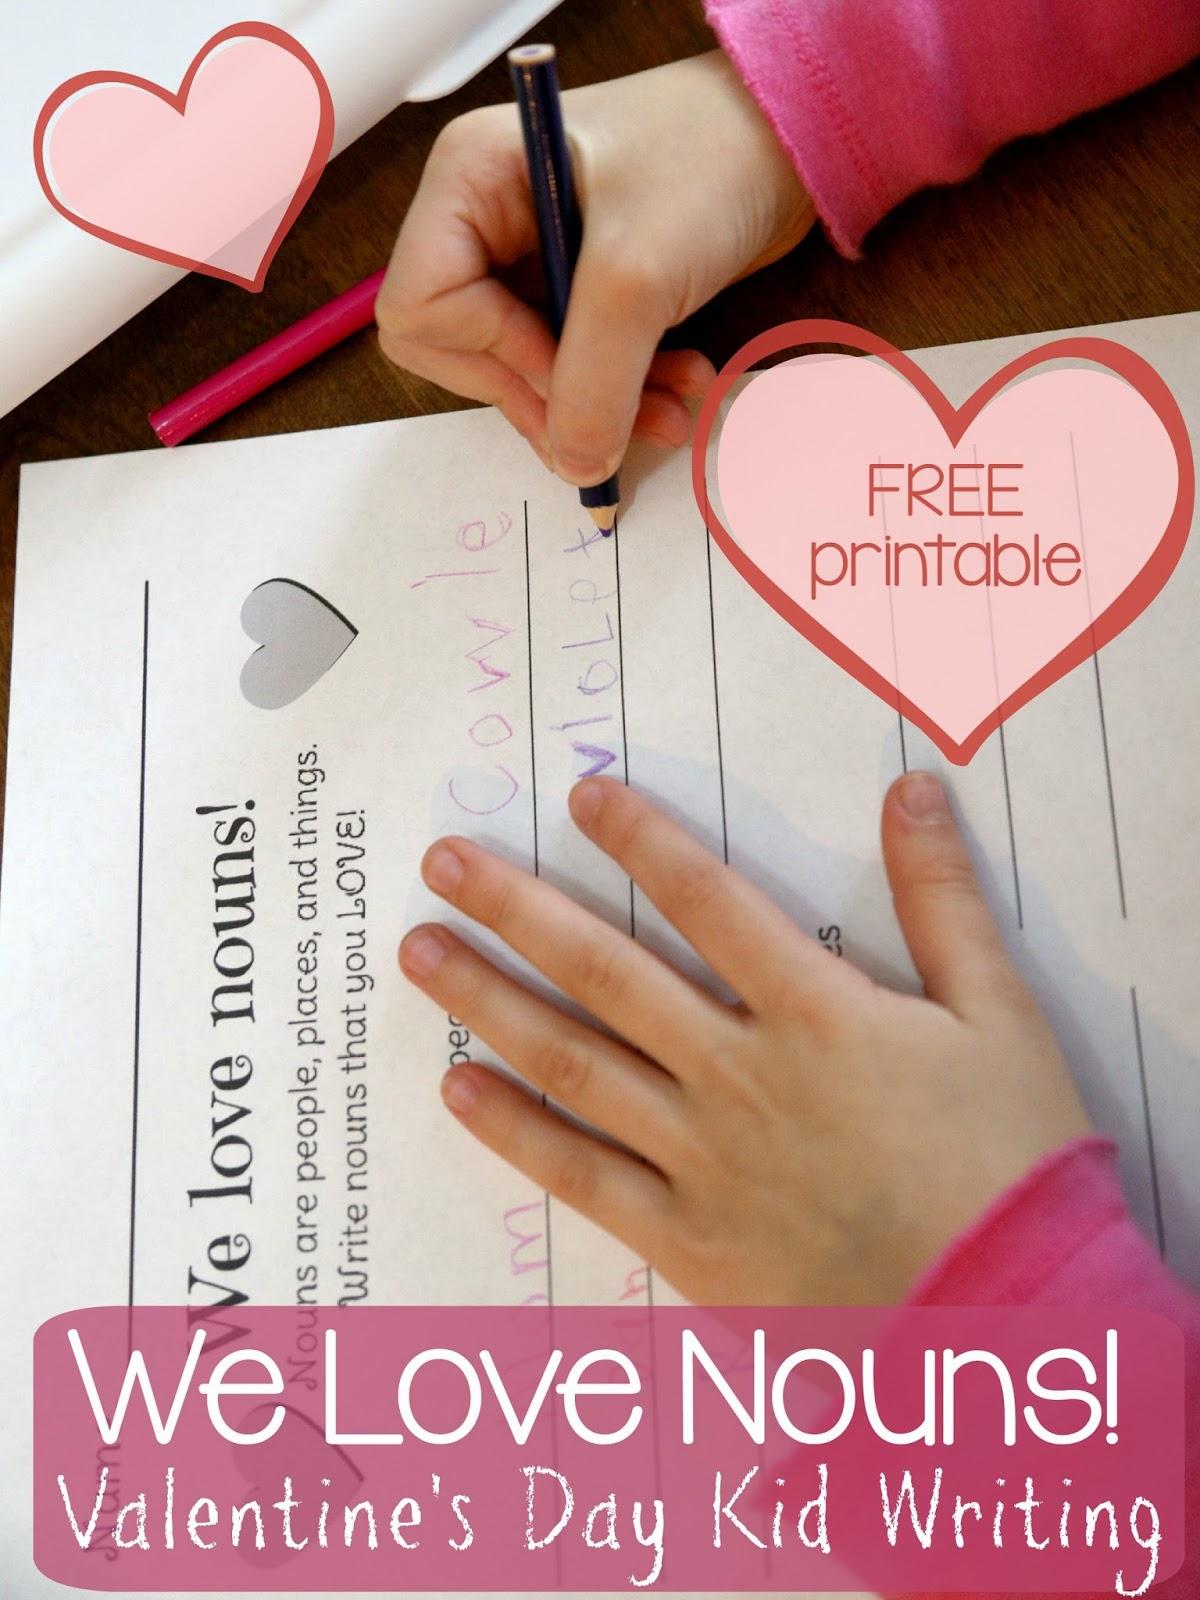 We Love Nouns Kid Writing With Free Printable